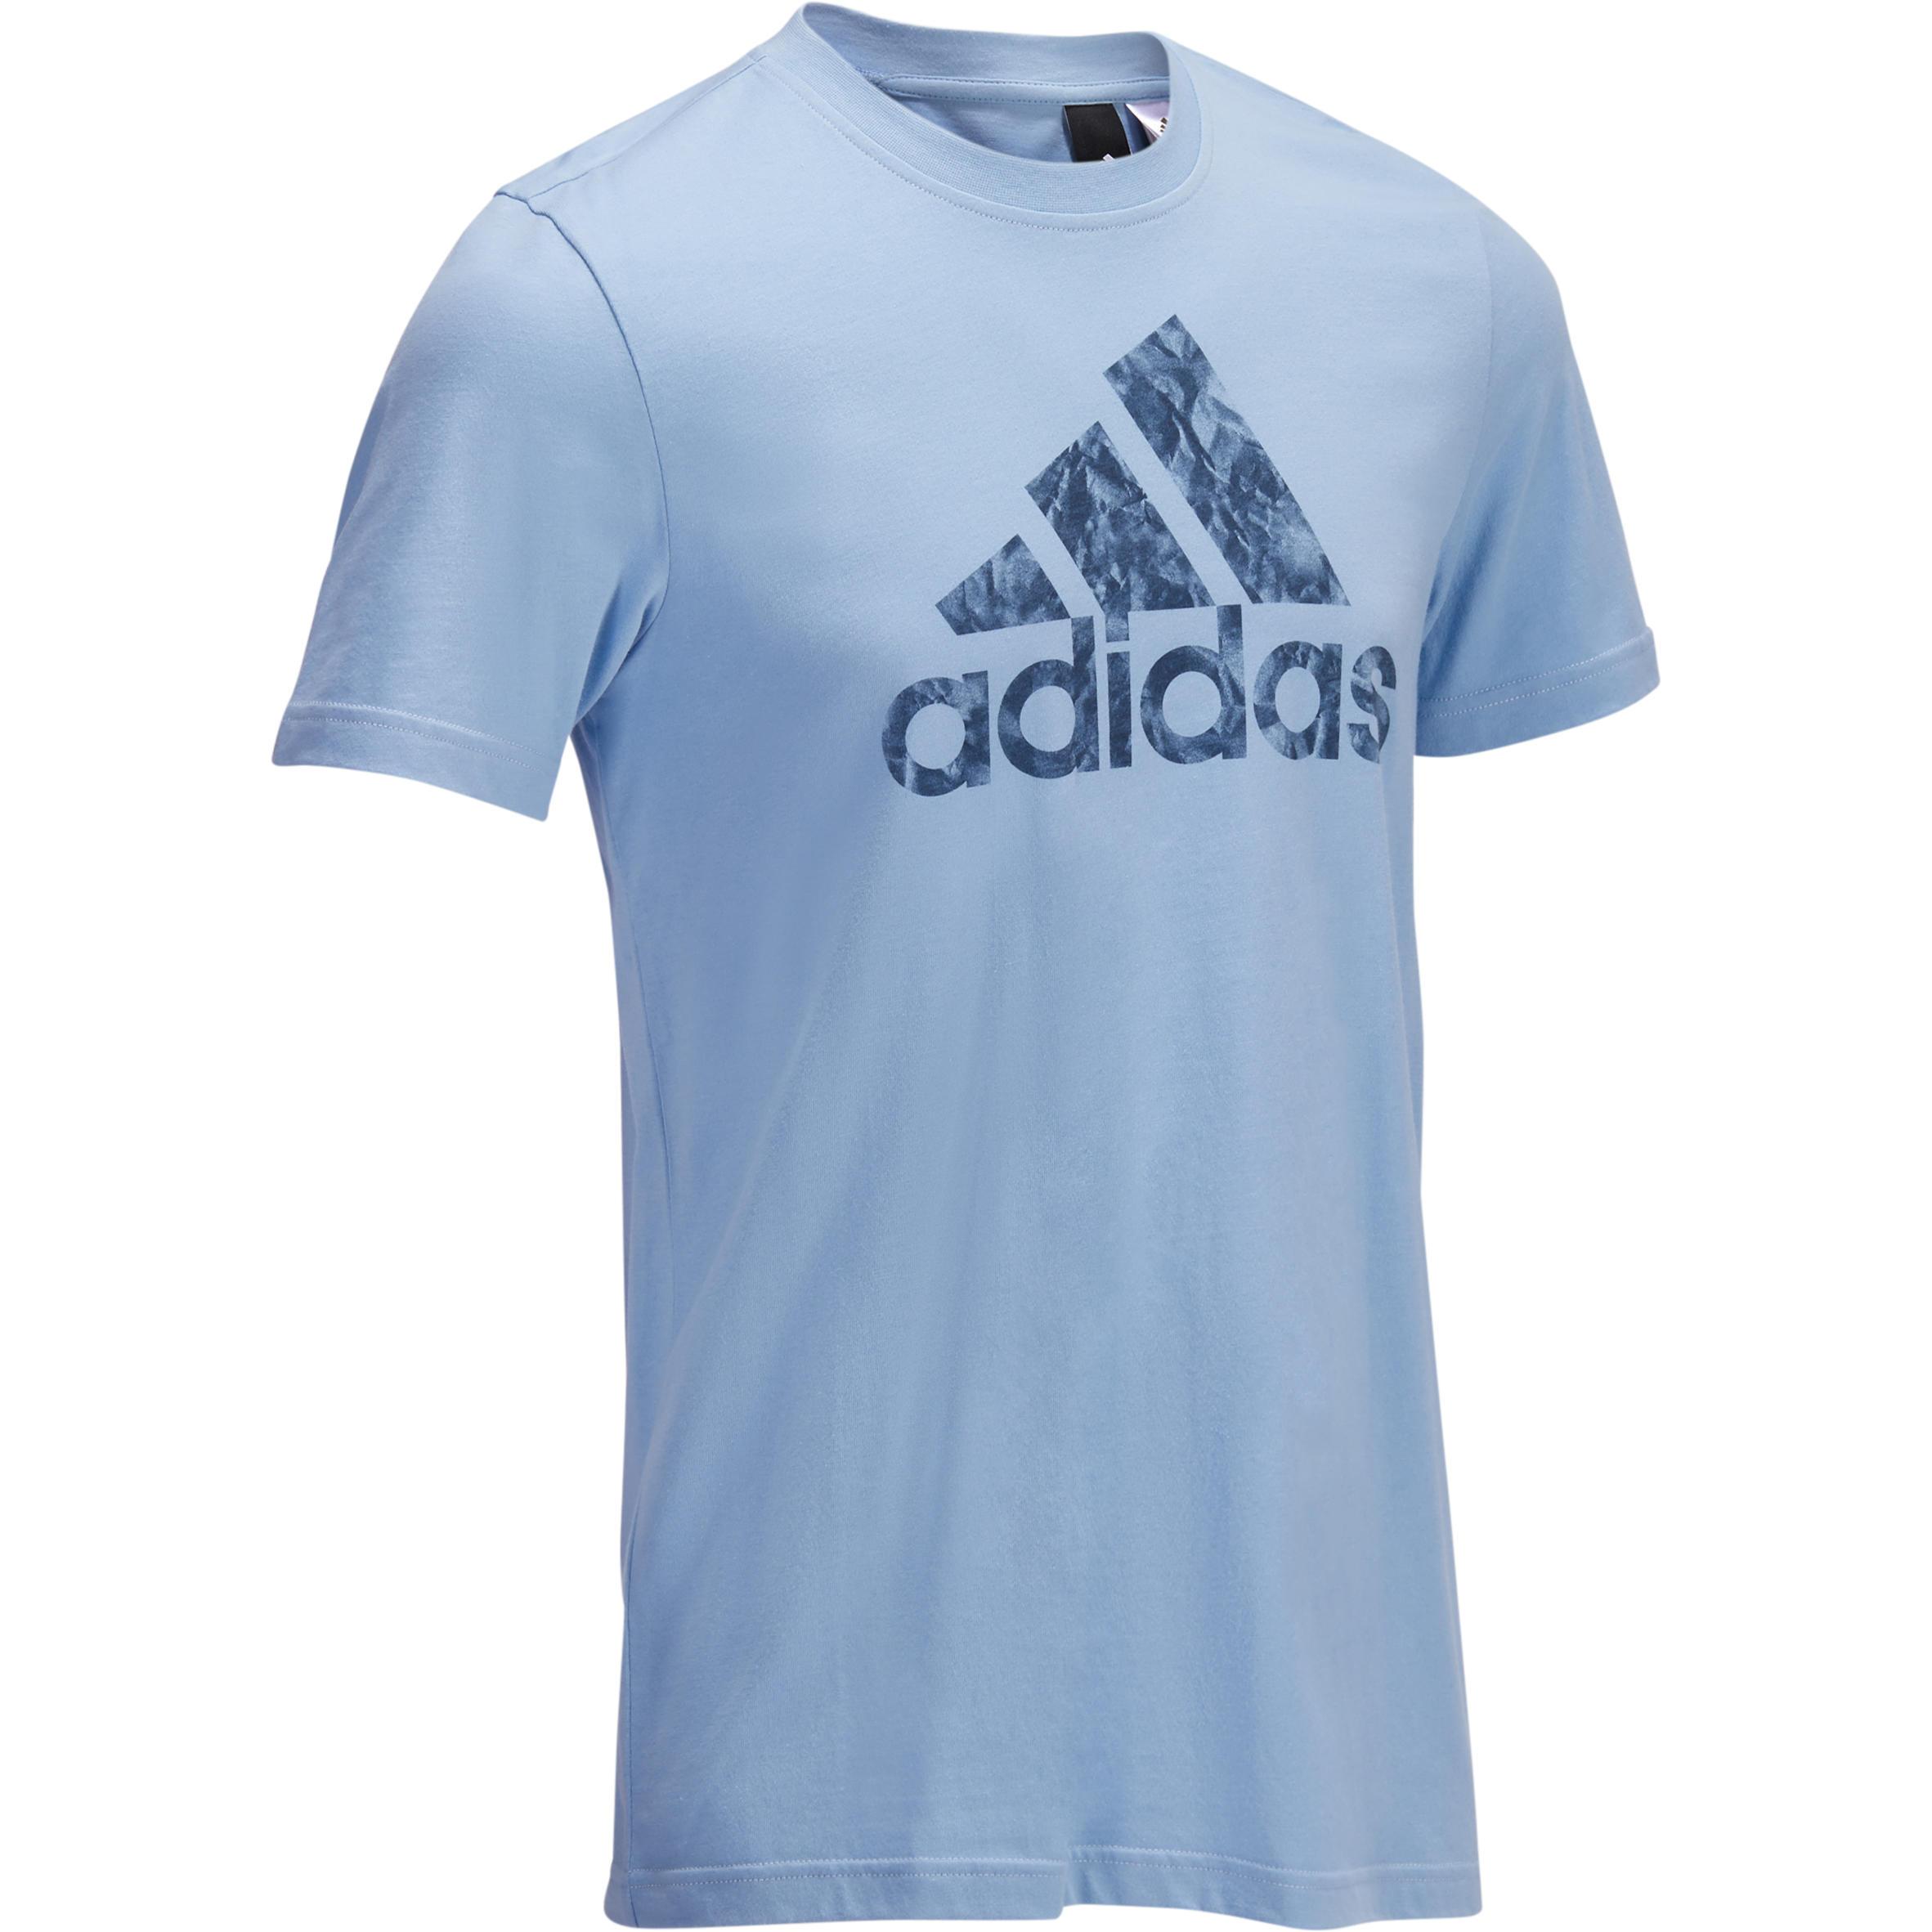 Adidas Heren T-shirt Adidas voor gym en pilates grafisch logo